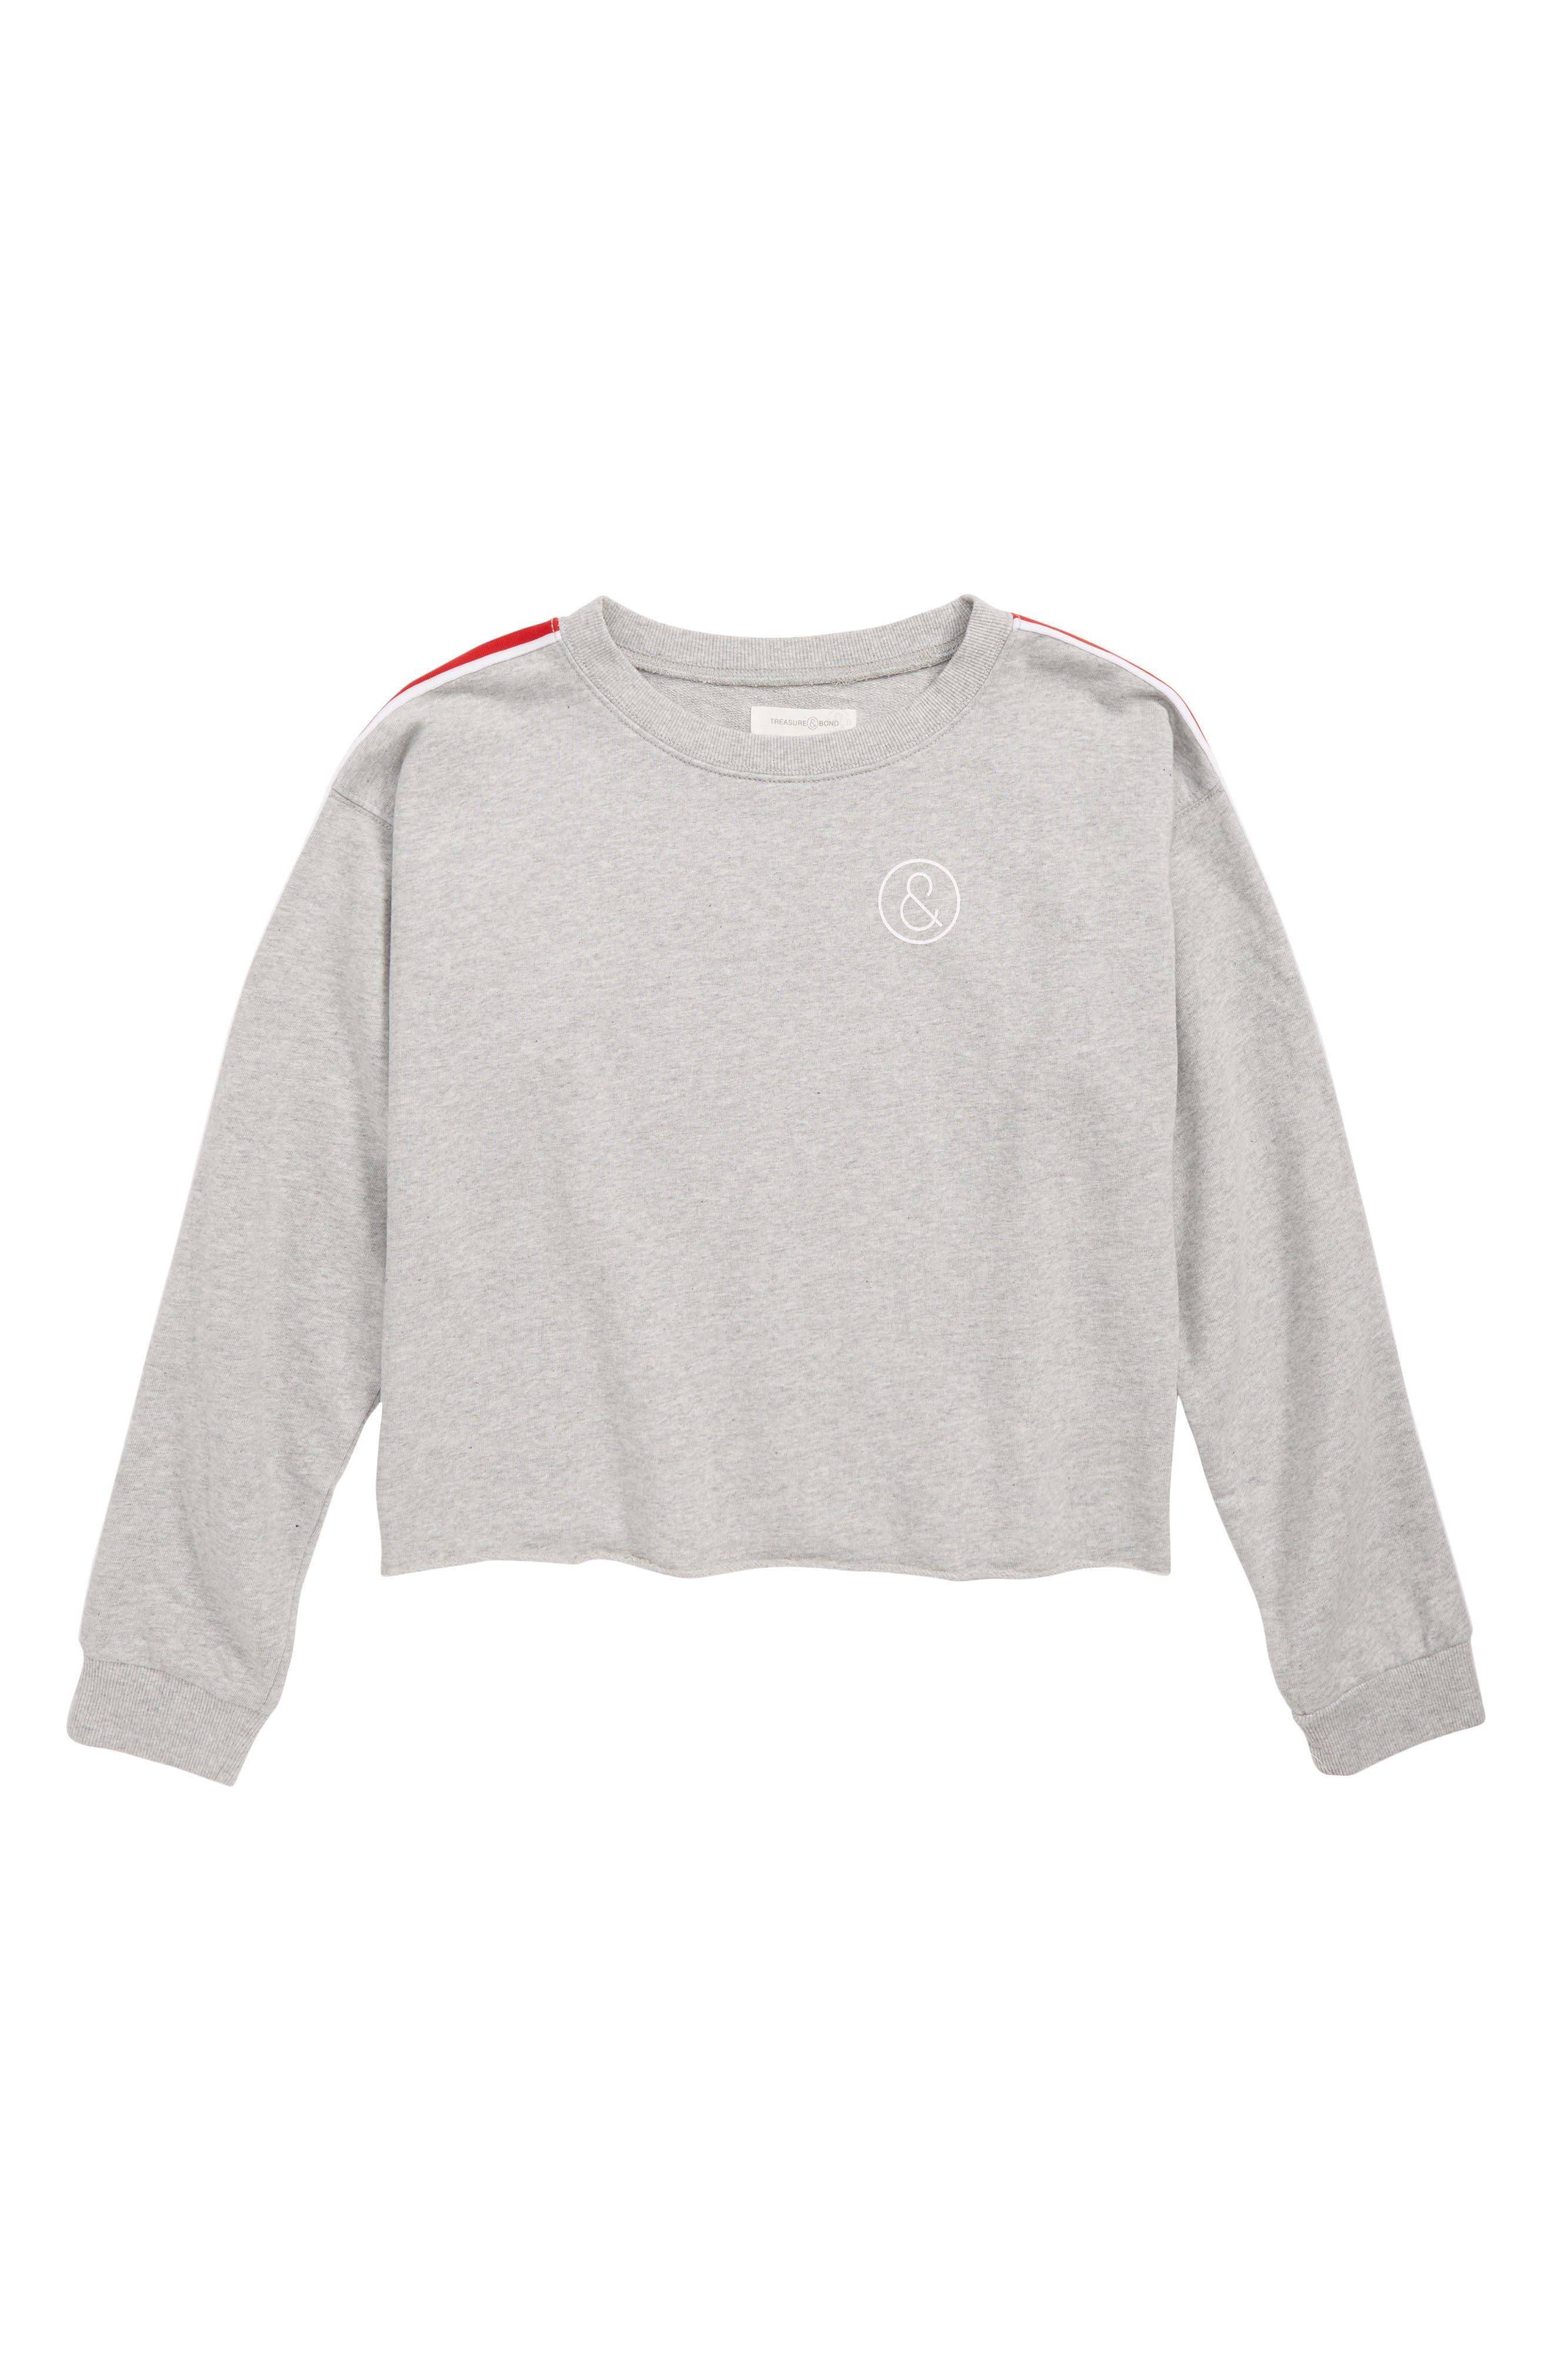 Varsity Fleece Sweatshirt,                             Main thumbnail 1, color,                             050